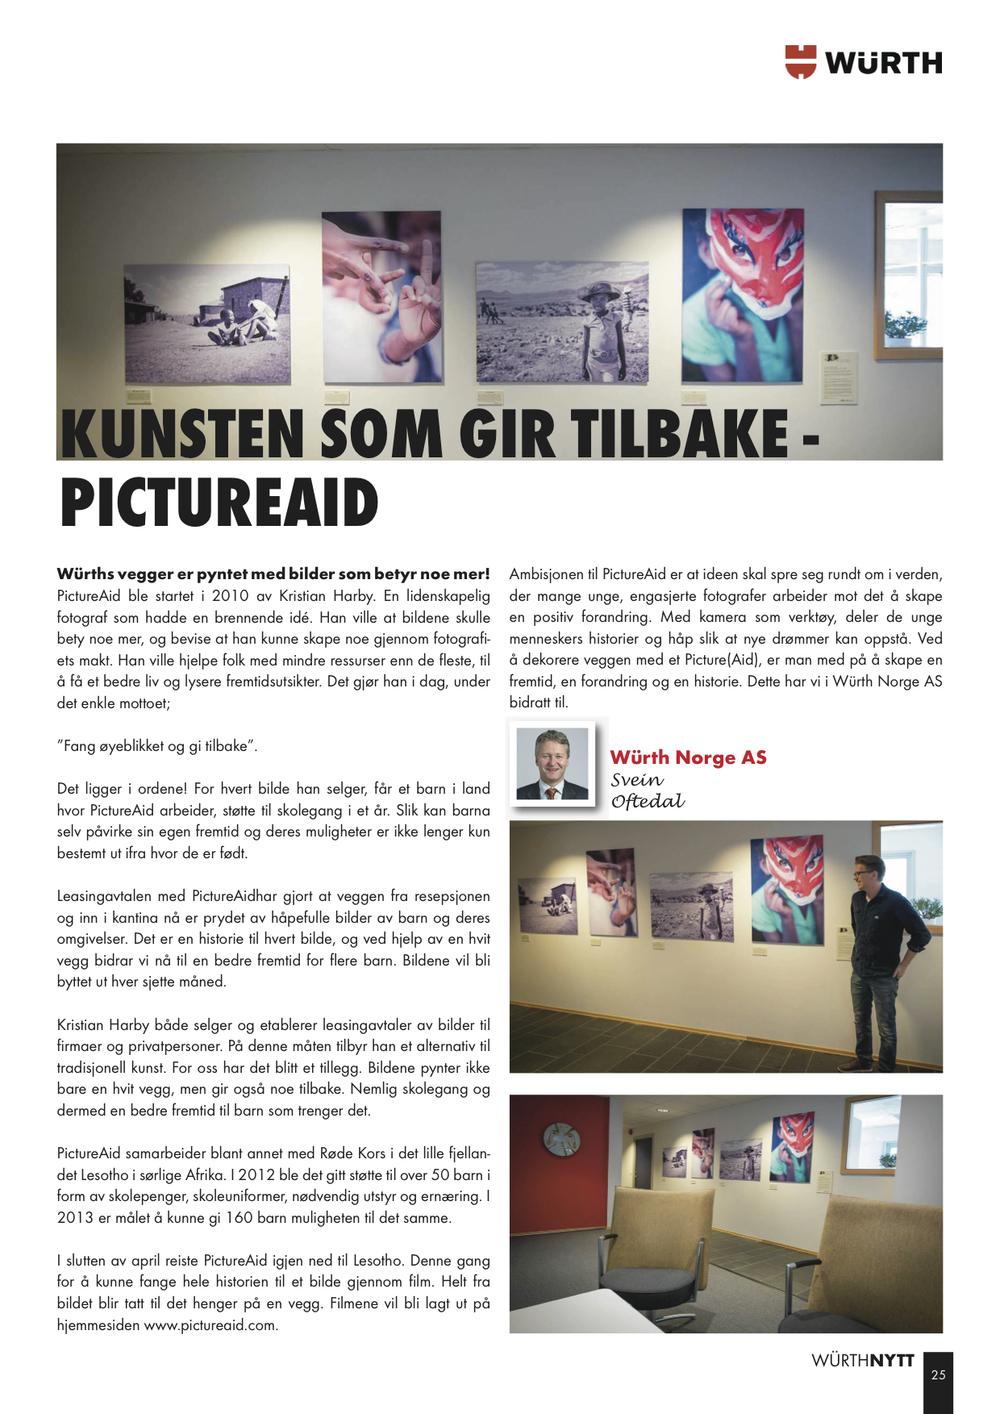 WurthNytt mai 2013 - side 25.jpg